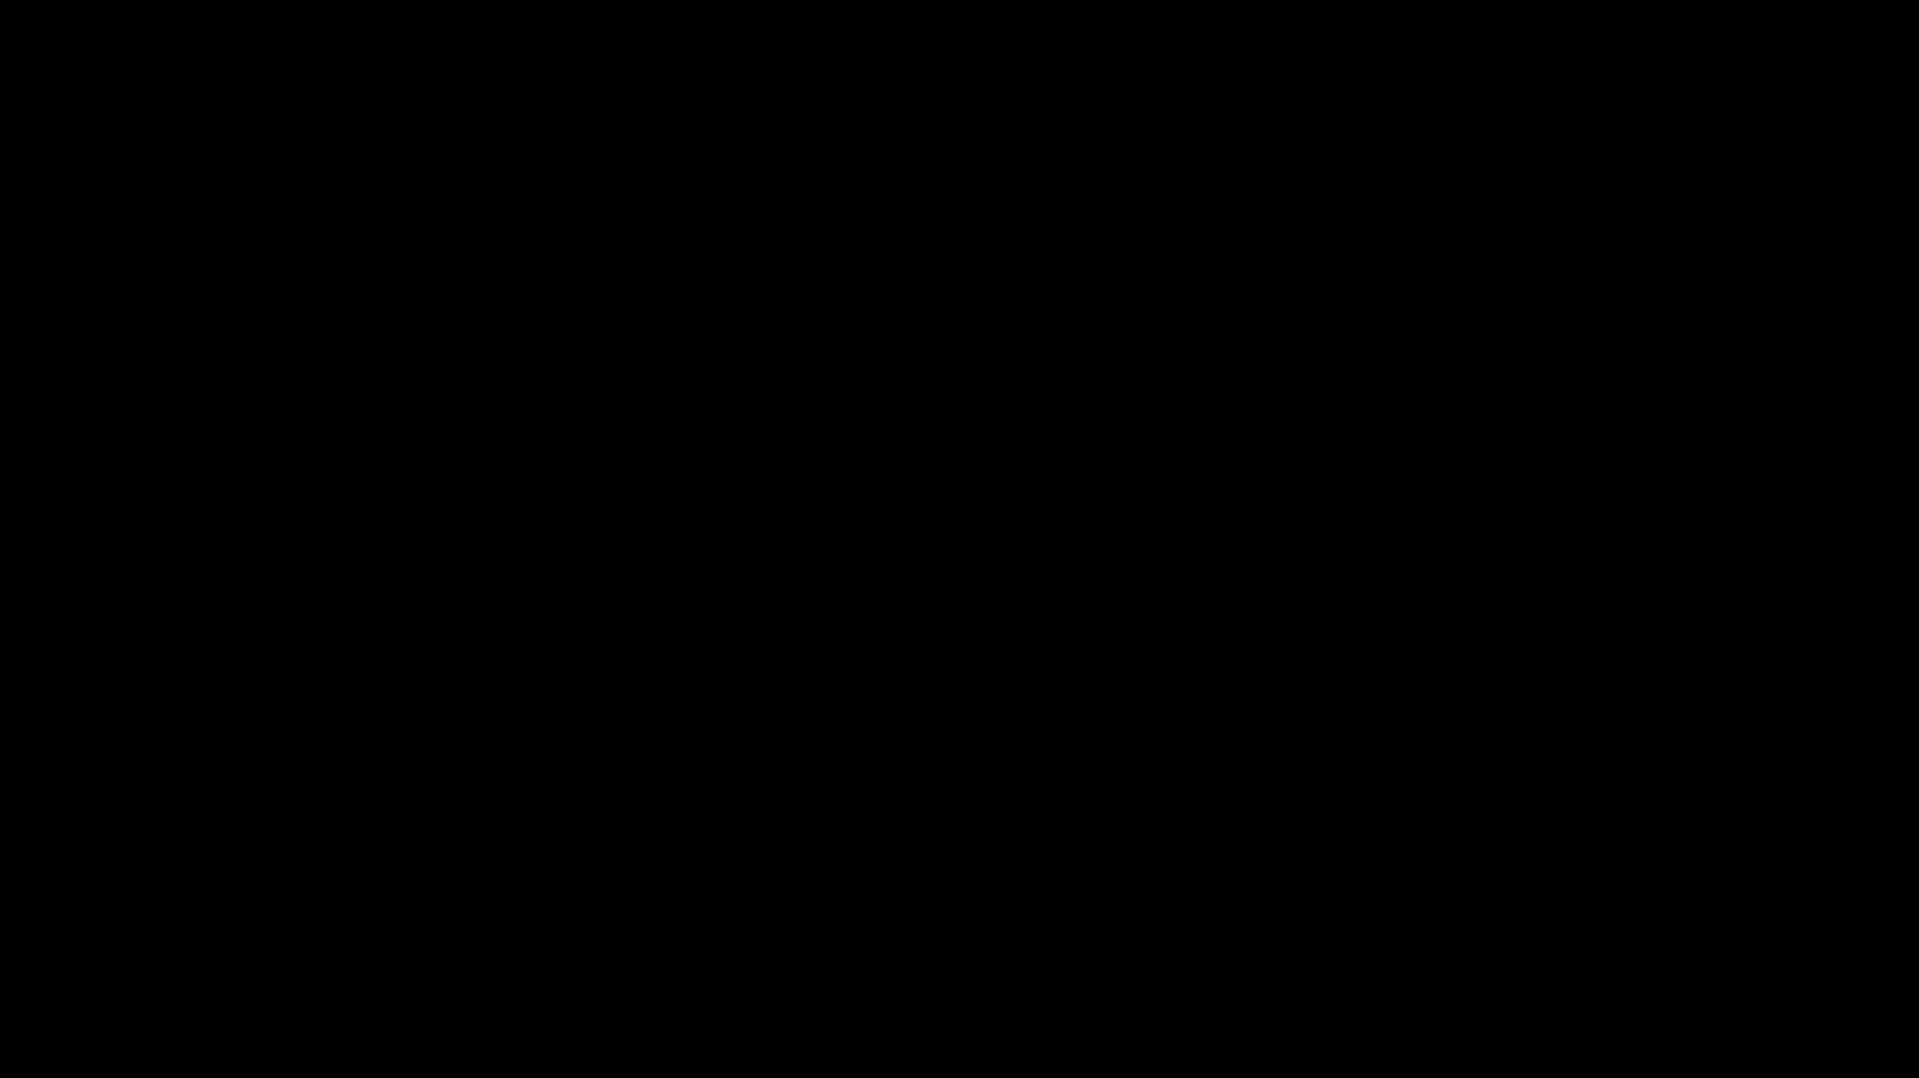 NASK Rejestr PL Explainer Video - Ilustracja strony